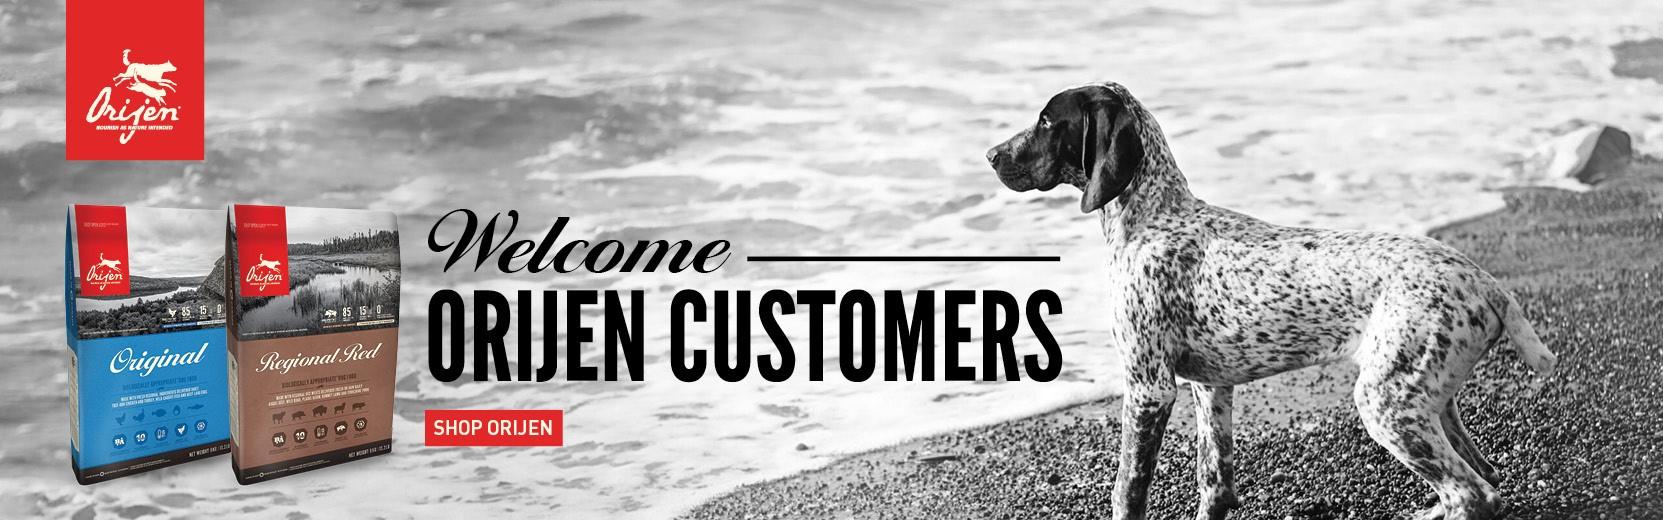 shop orijen products